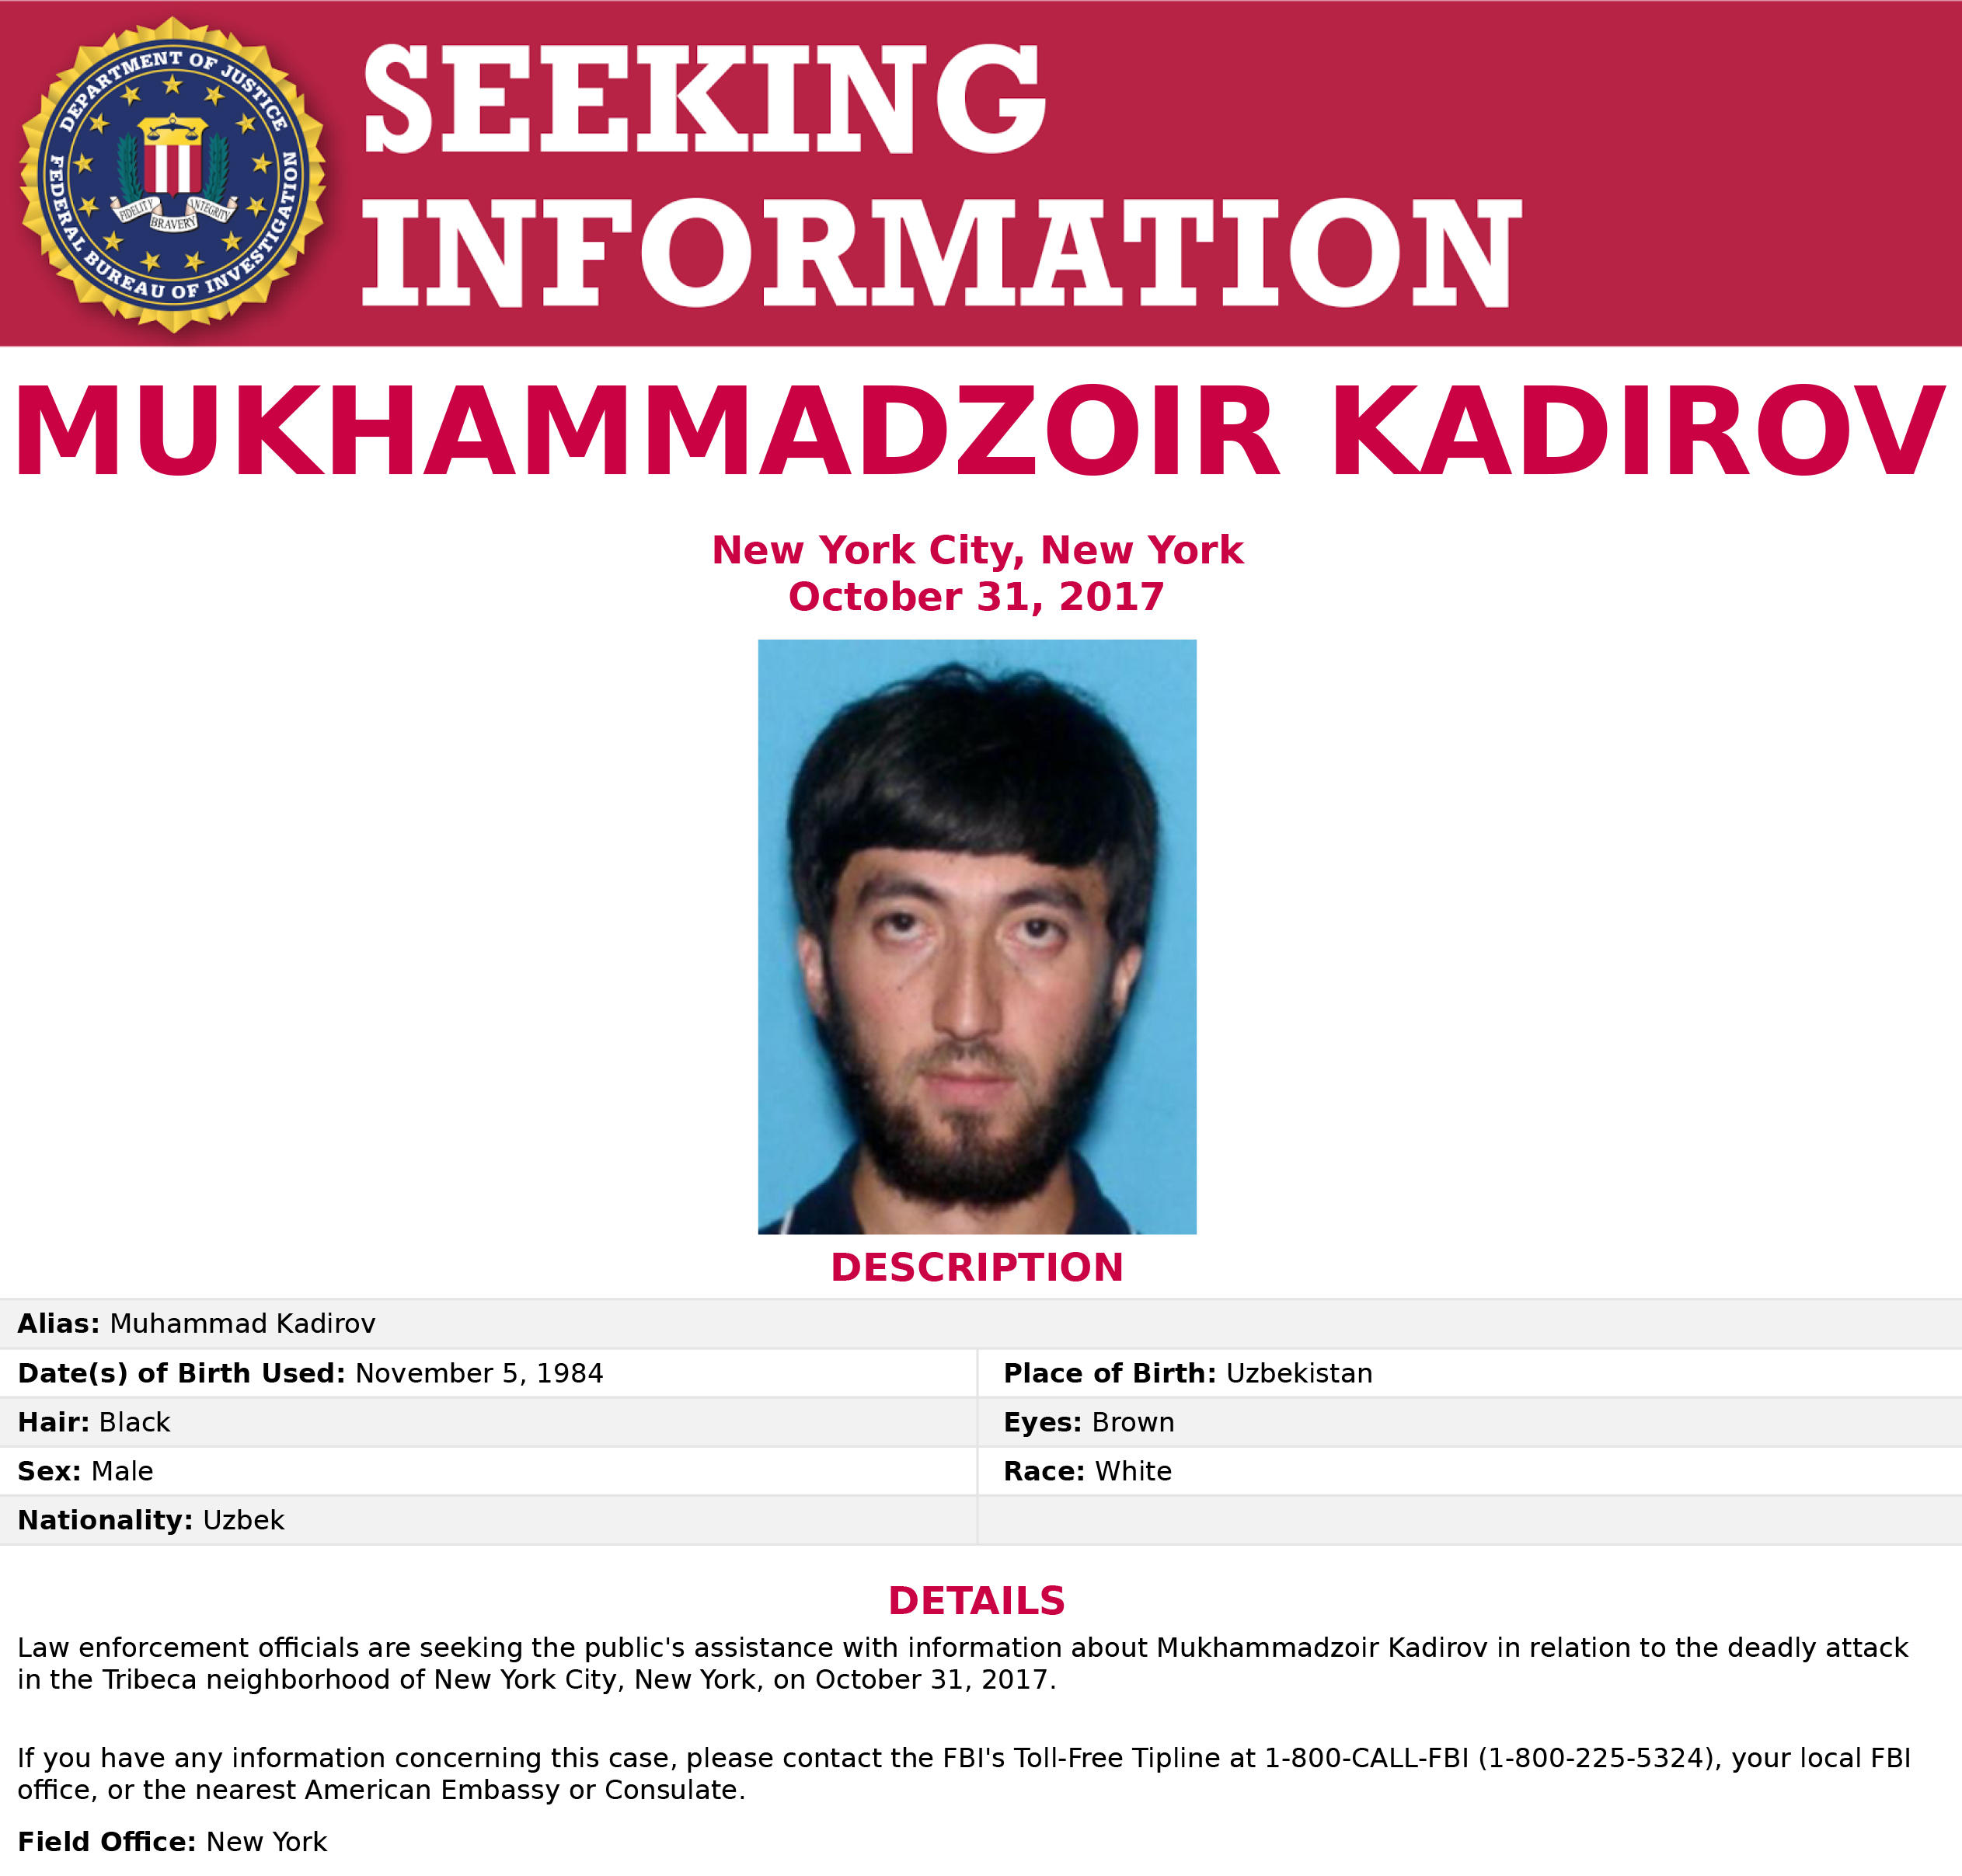 New York terror attack: Man FBI was seeking speaks out - CBS News